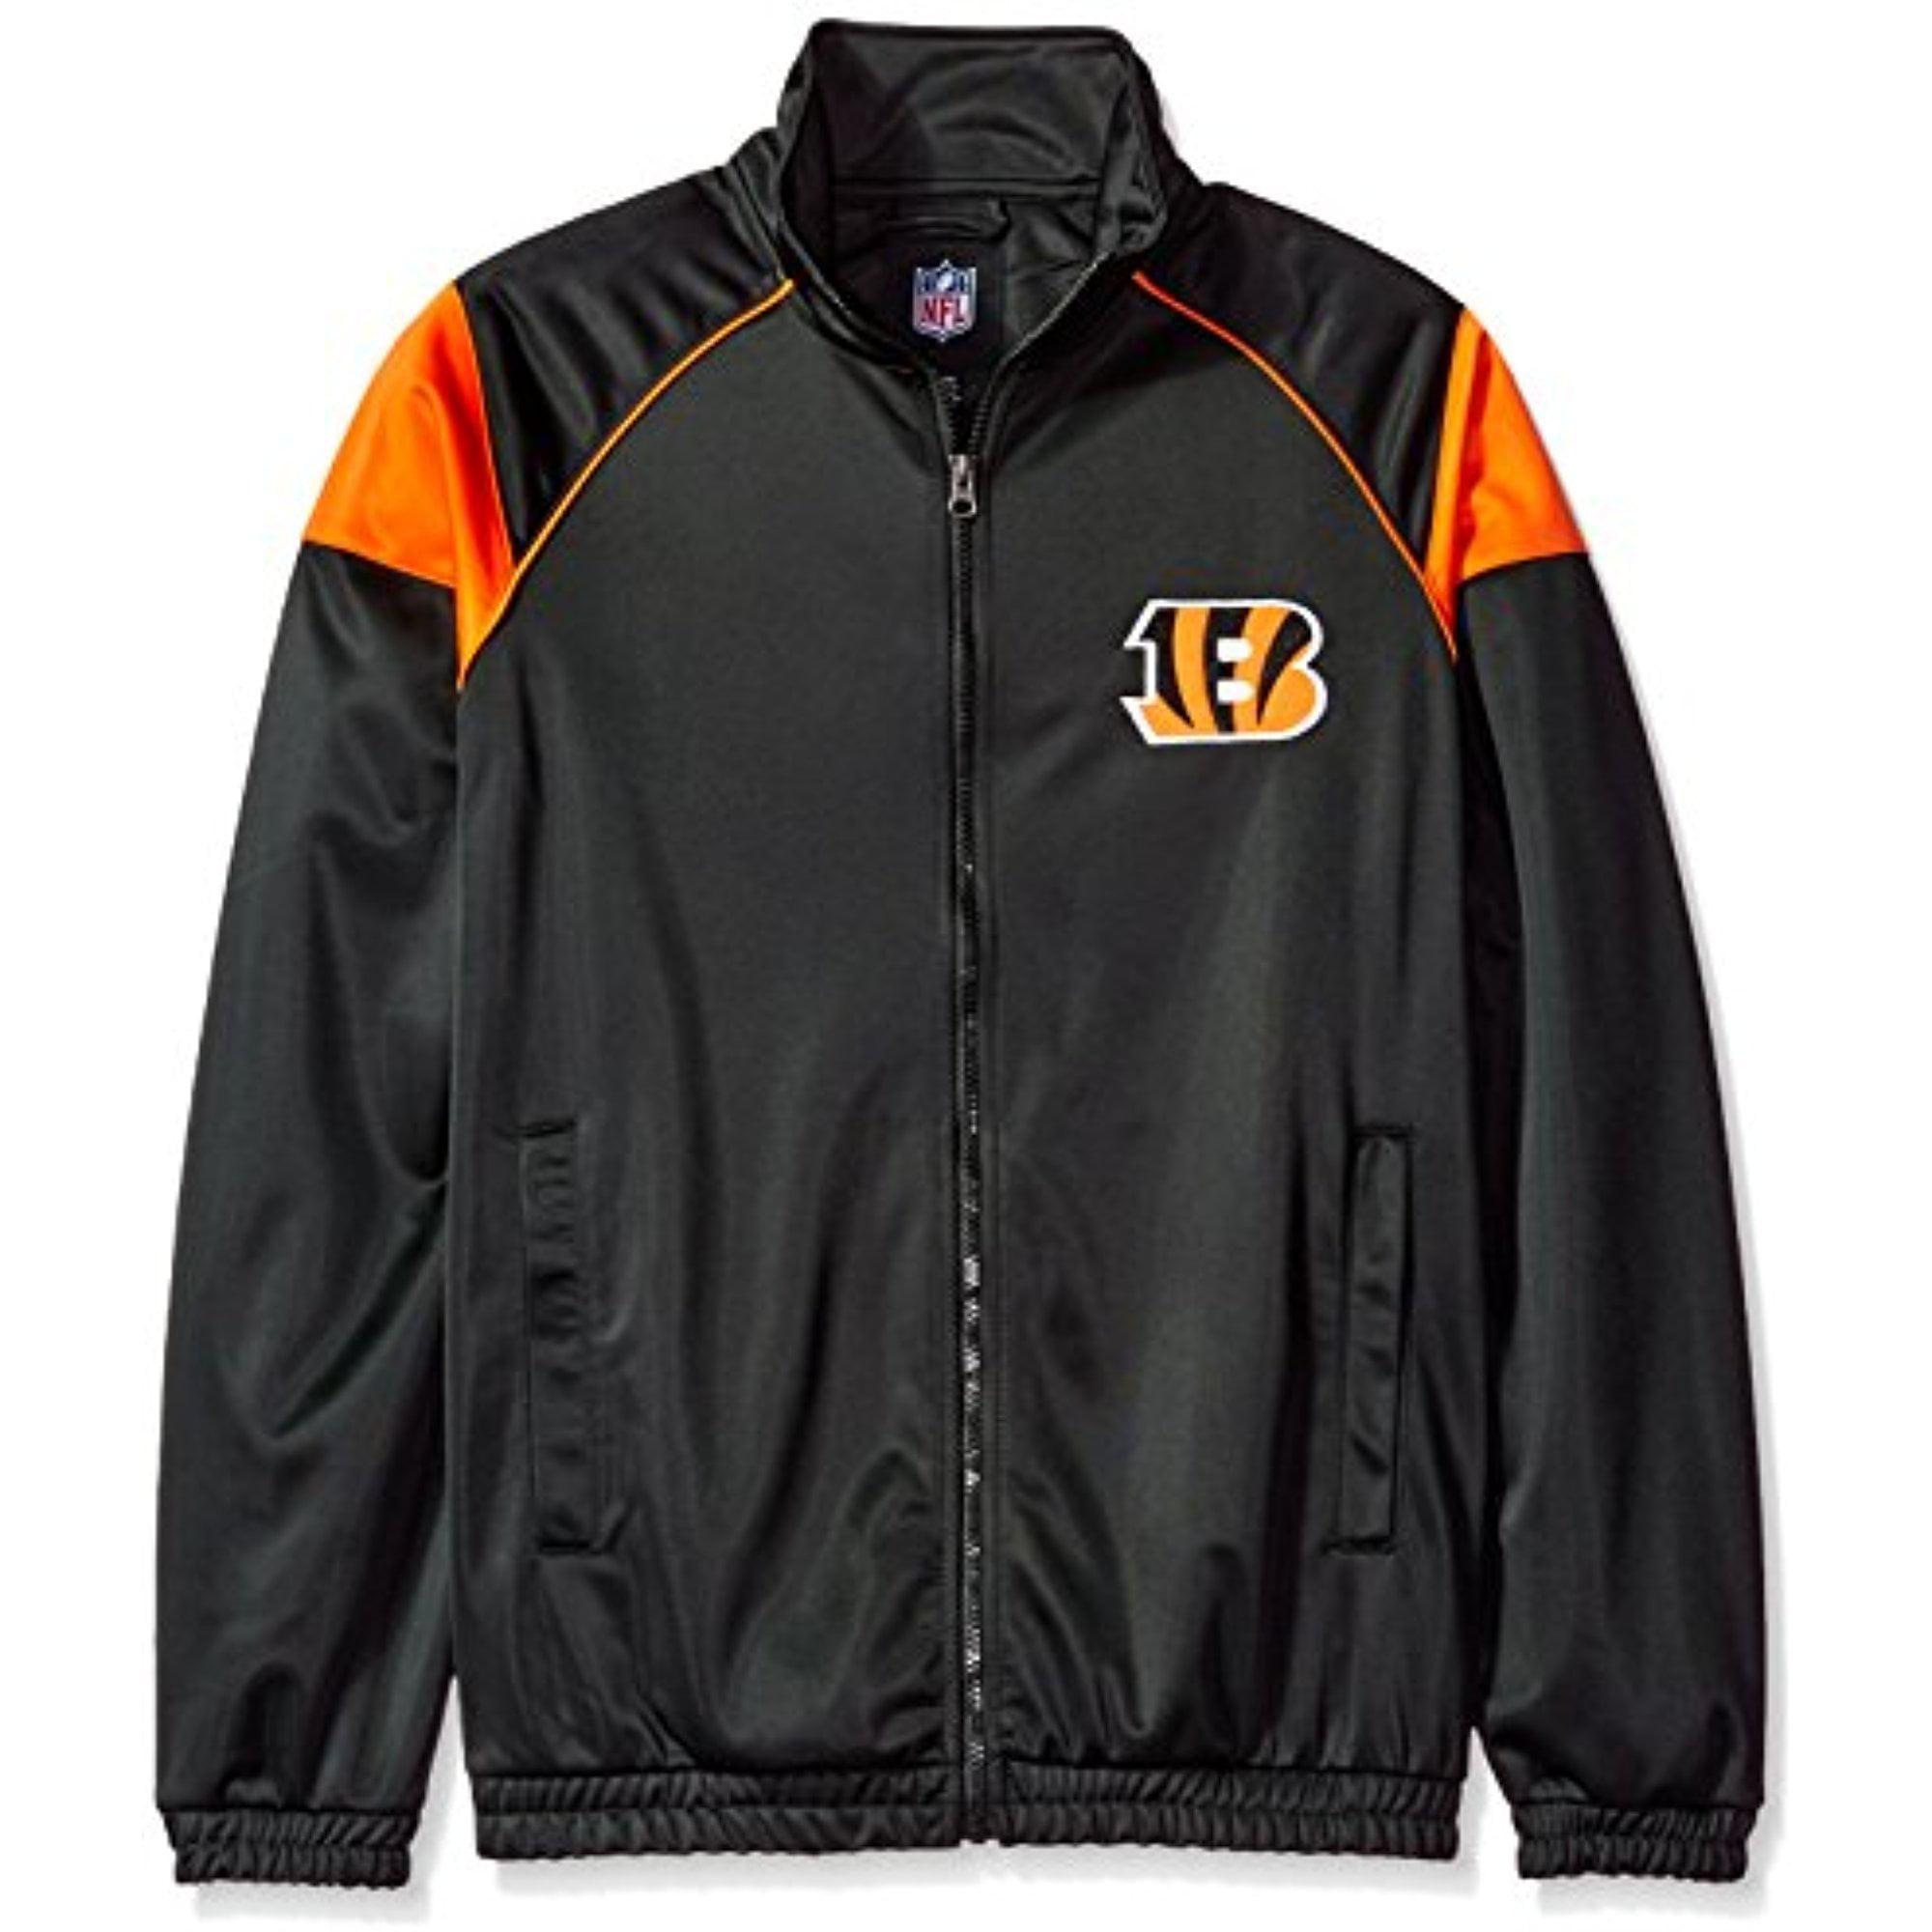 NFL Cincinnati Bengals Men's G-III Sports Dash Track Jacket, Black, Large by